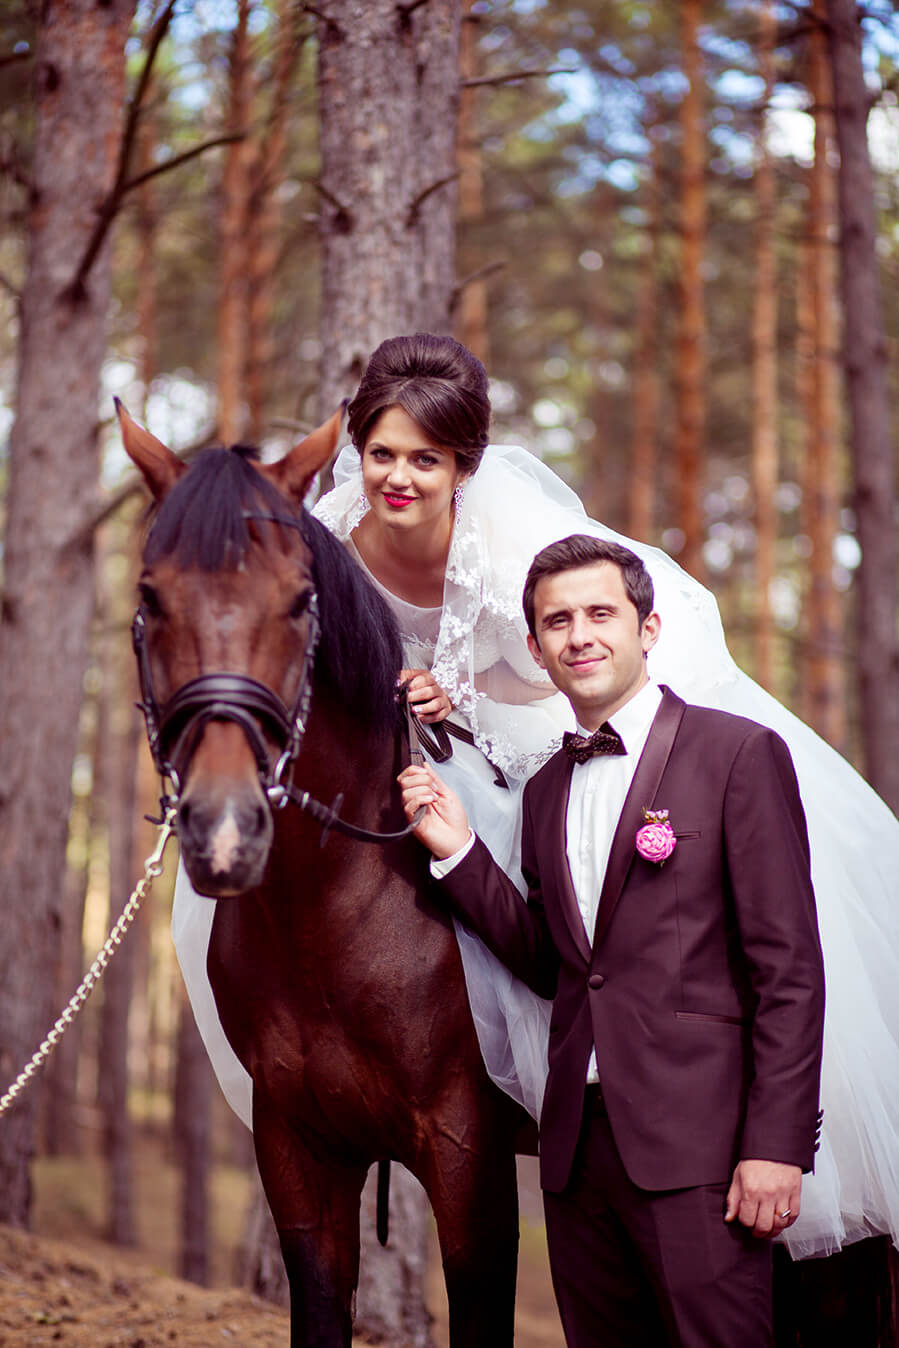 4-svadebnaja-fotosessija-na-konjah-3